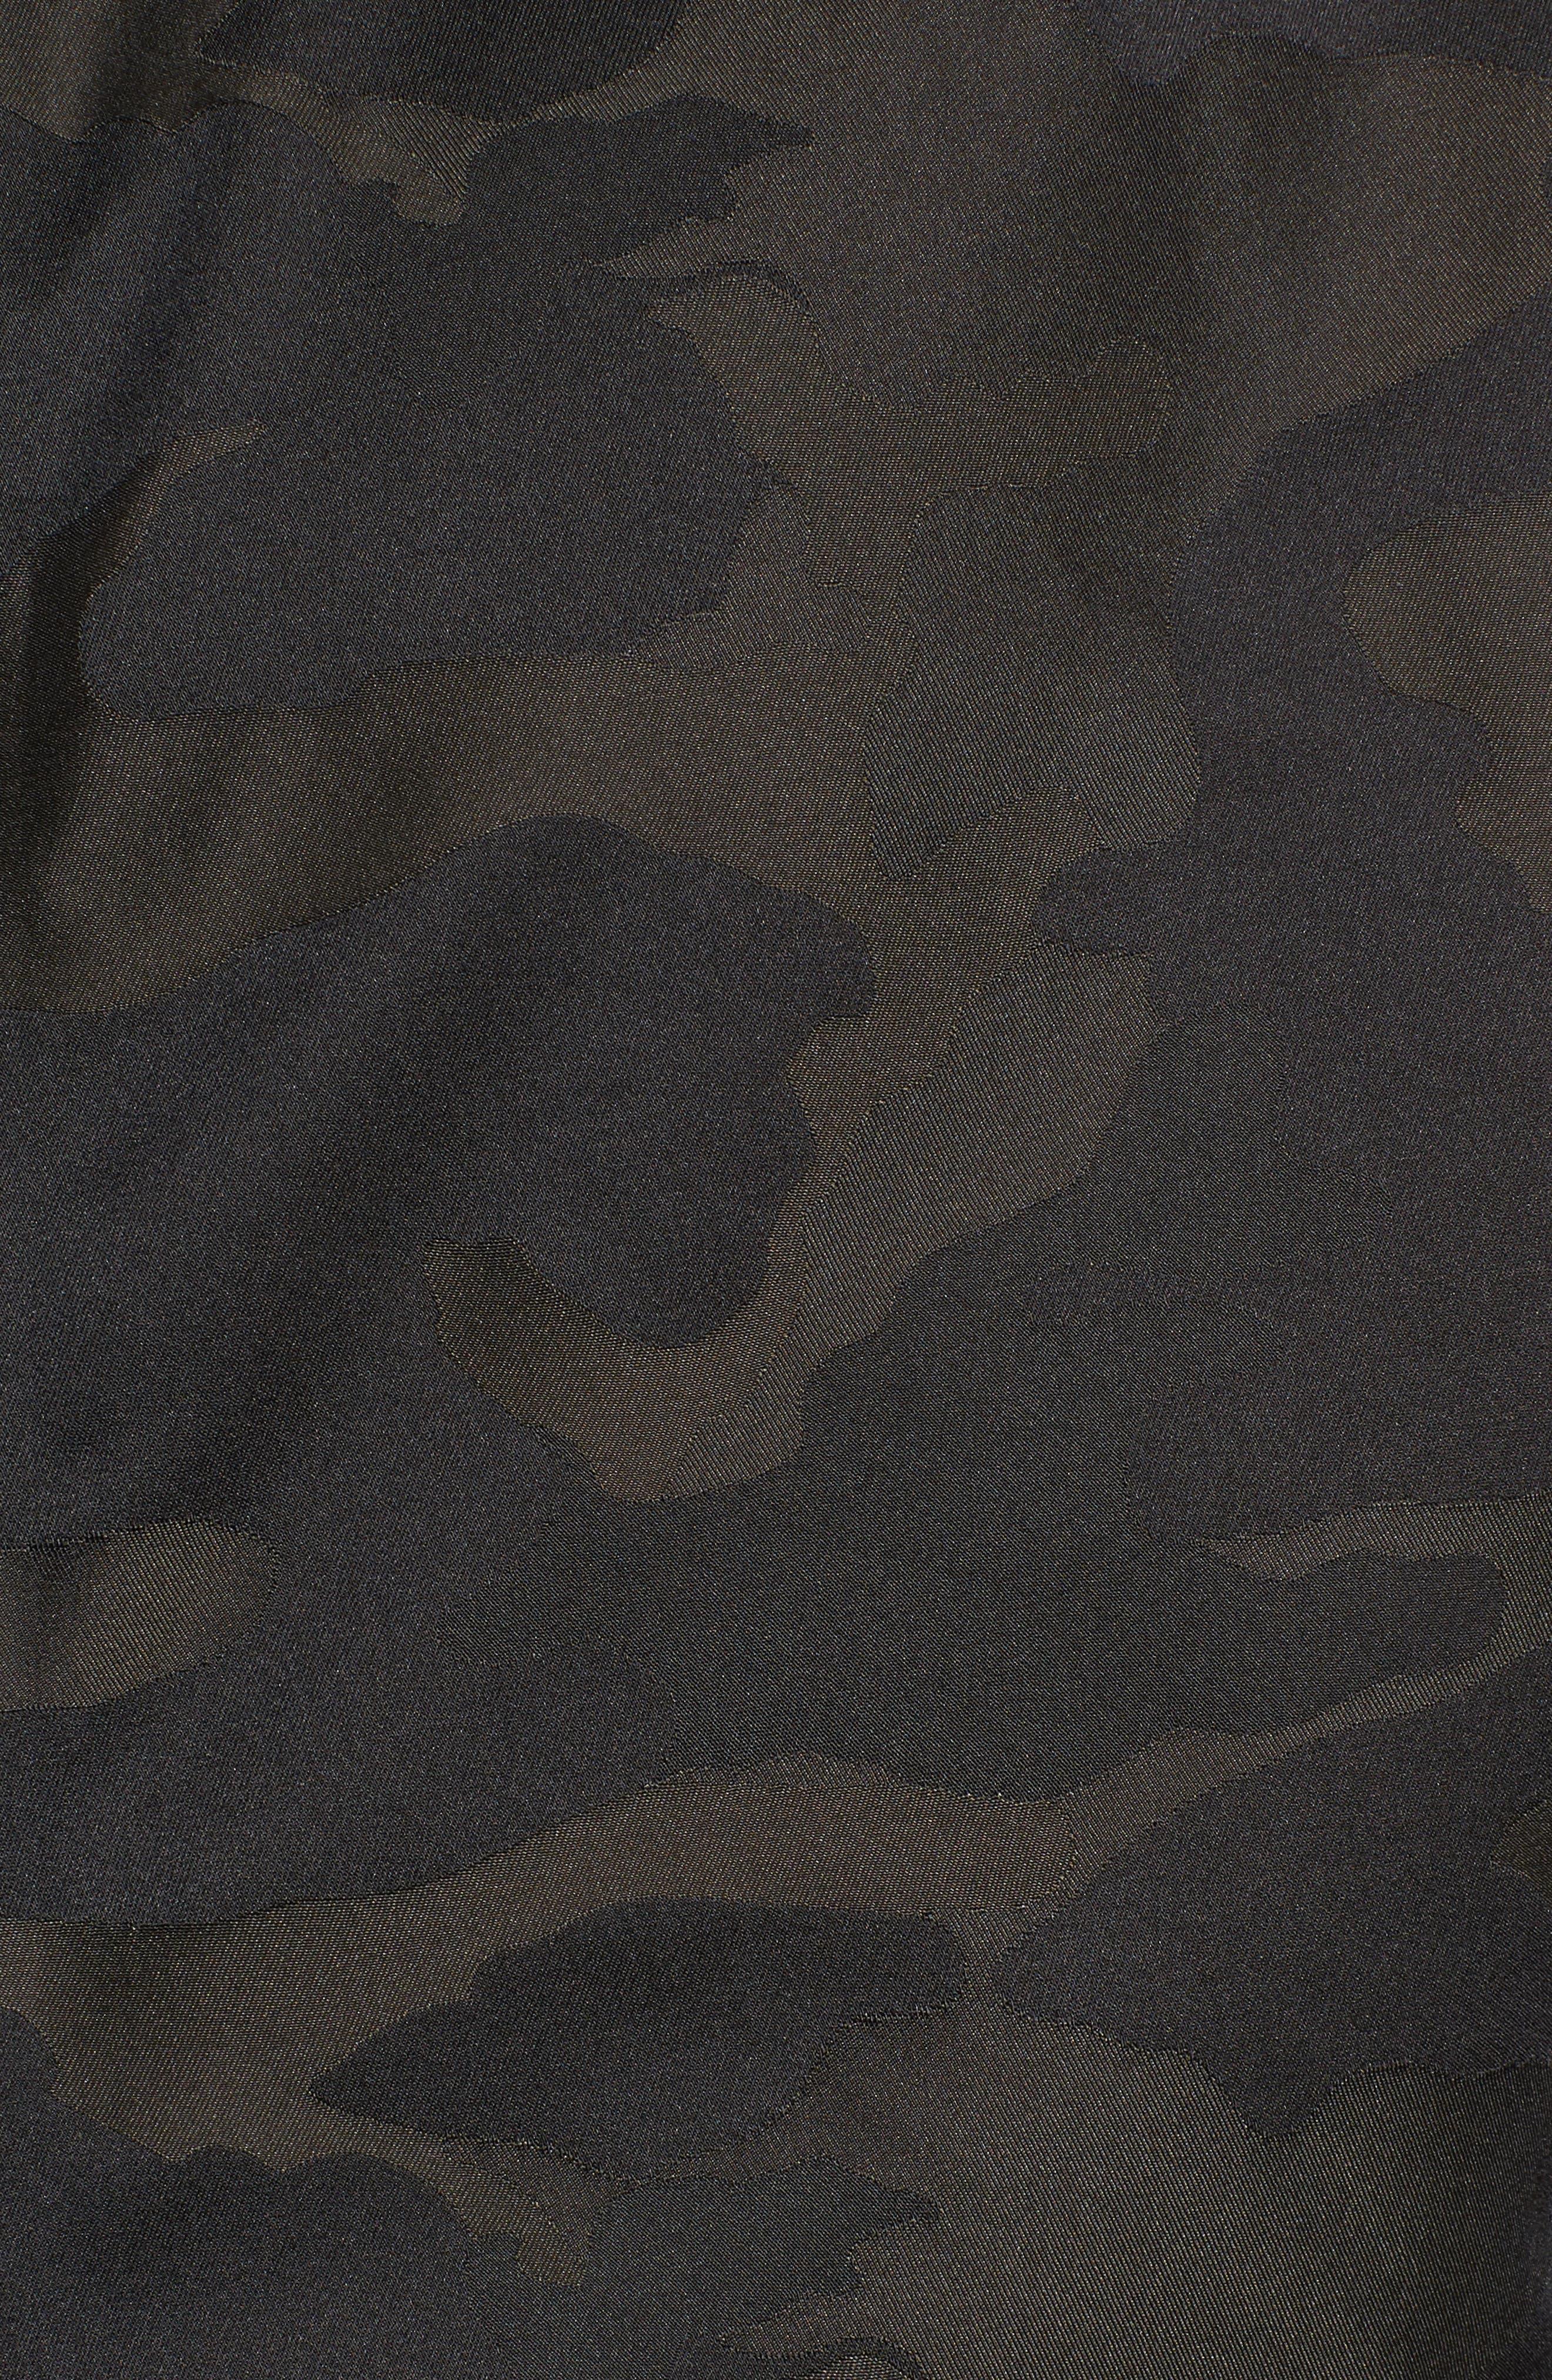 Torrent Camo Jacket,                             Alternate thumbnail 7, color,                             001